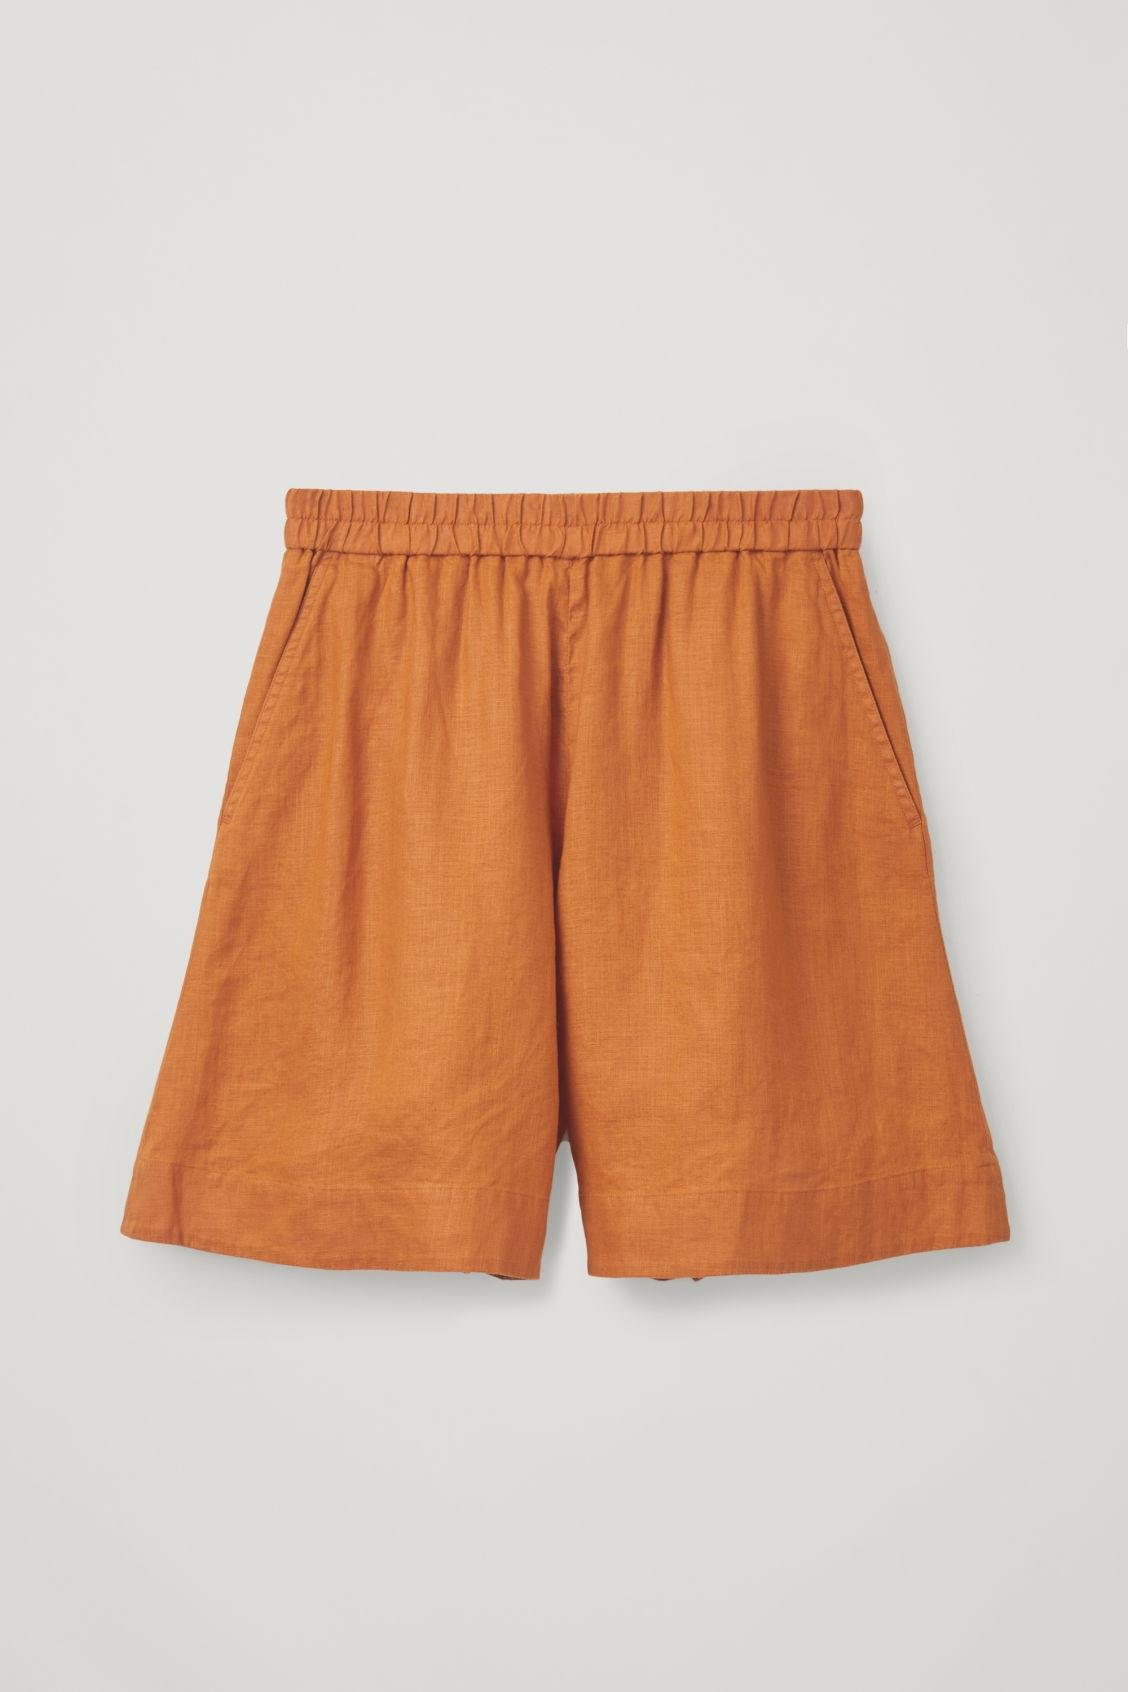 39991c8e74f4 Lyst - COS Lightweight Hemp Shorts in Yellow